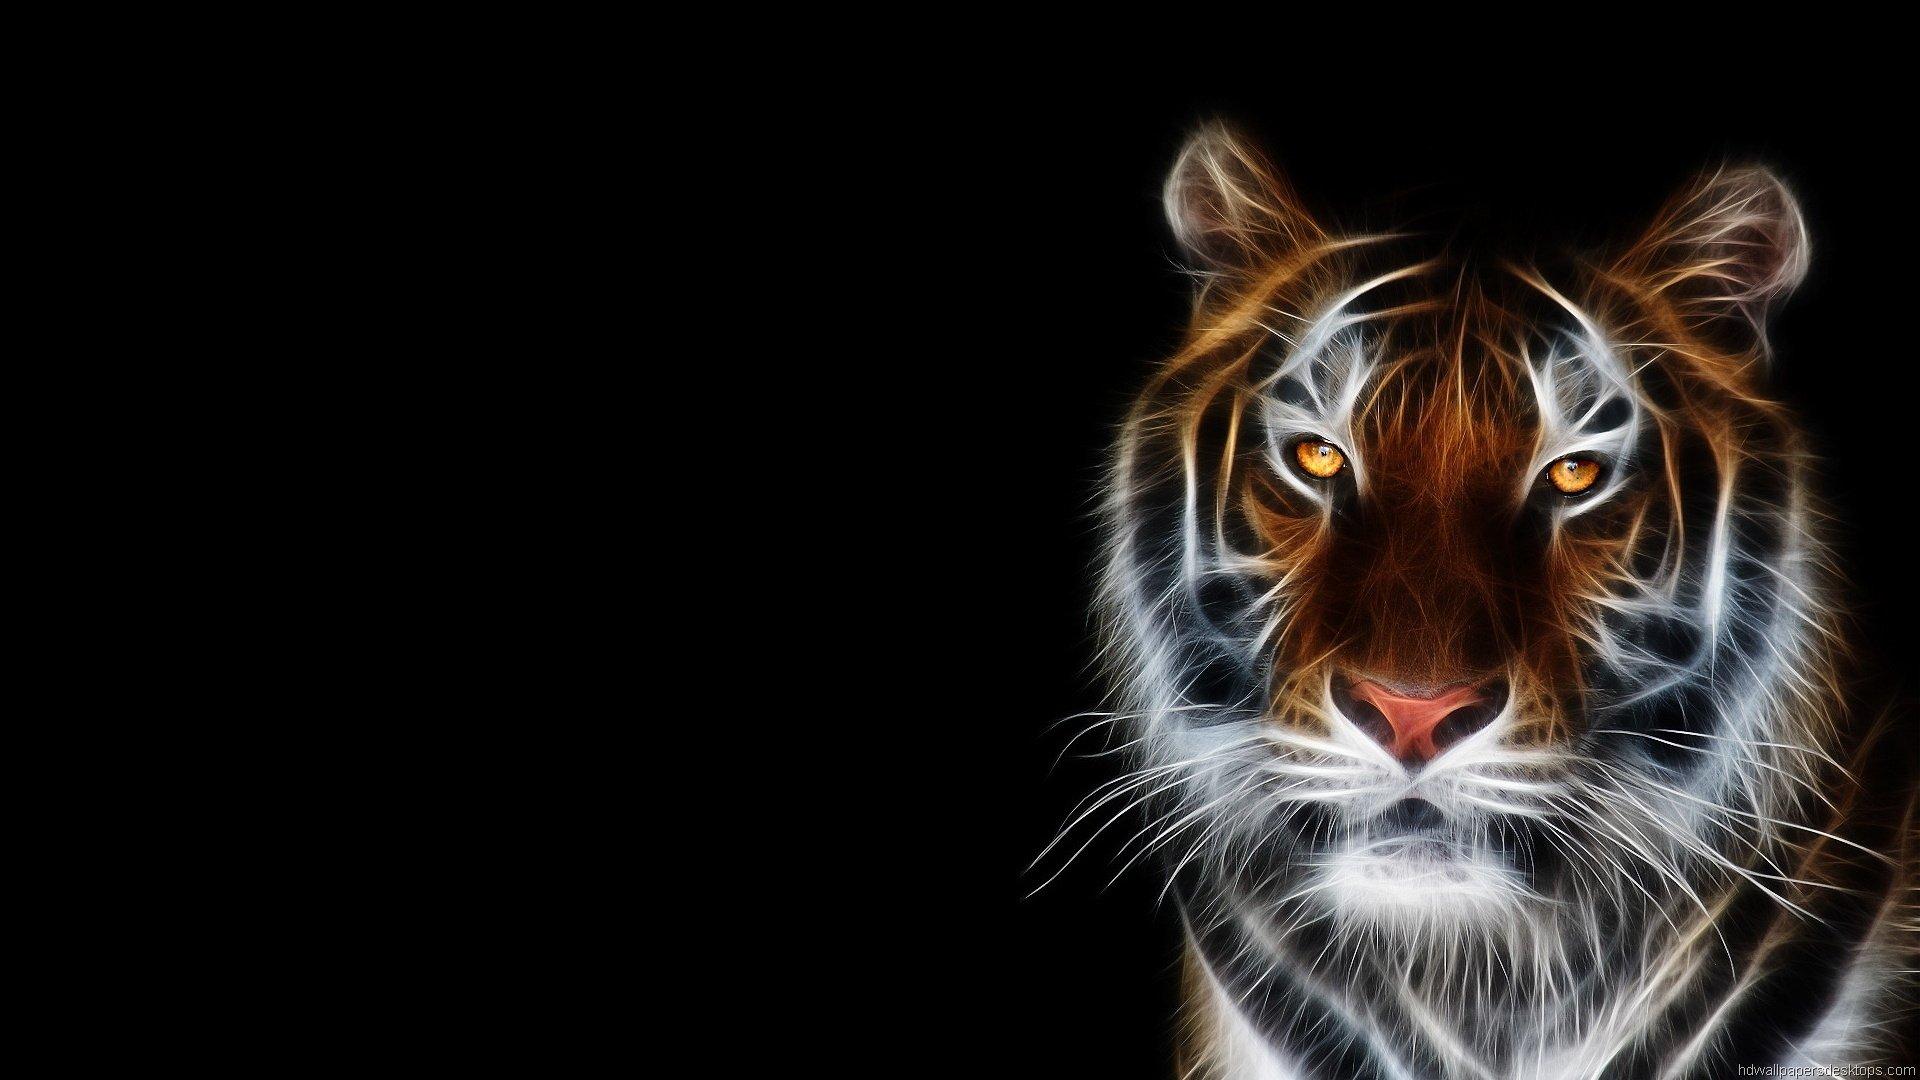 Hd Animals Wallpapers Free: HD Animal Wallpaper 1920x1080